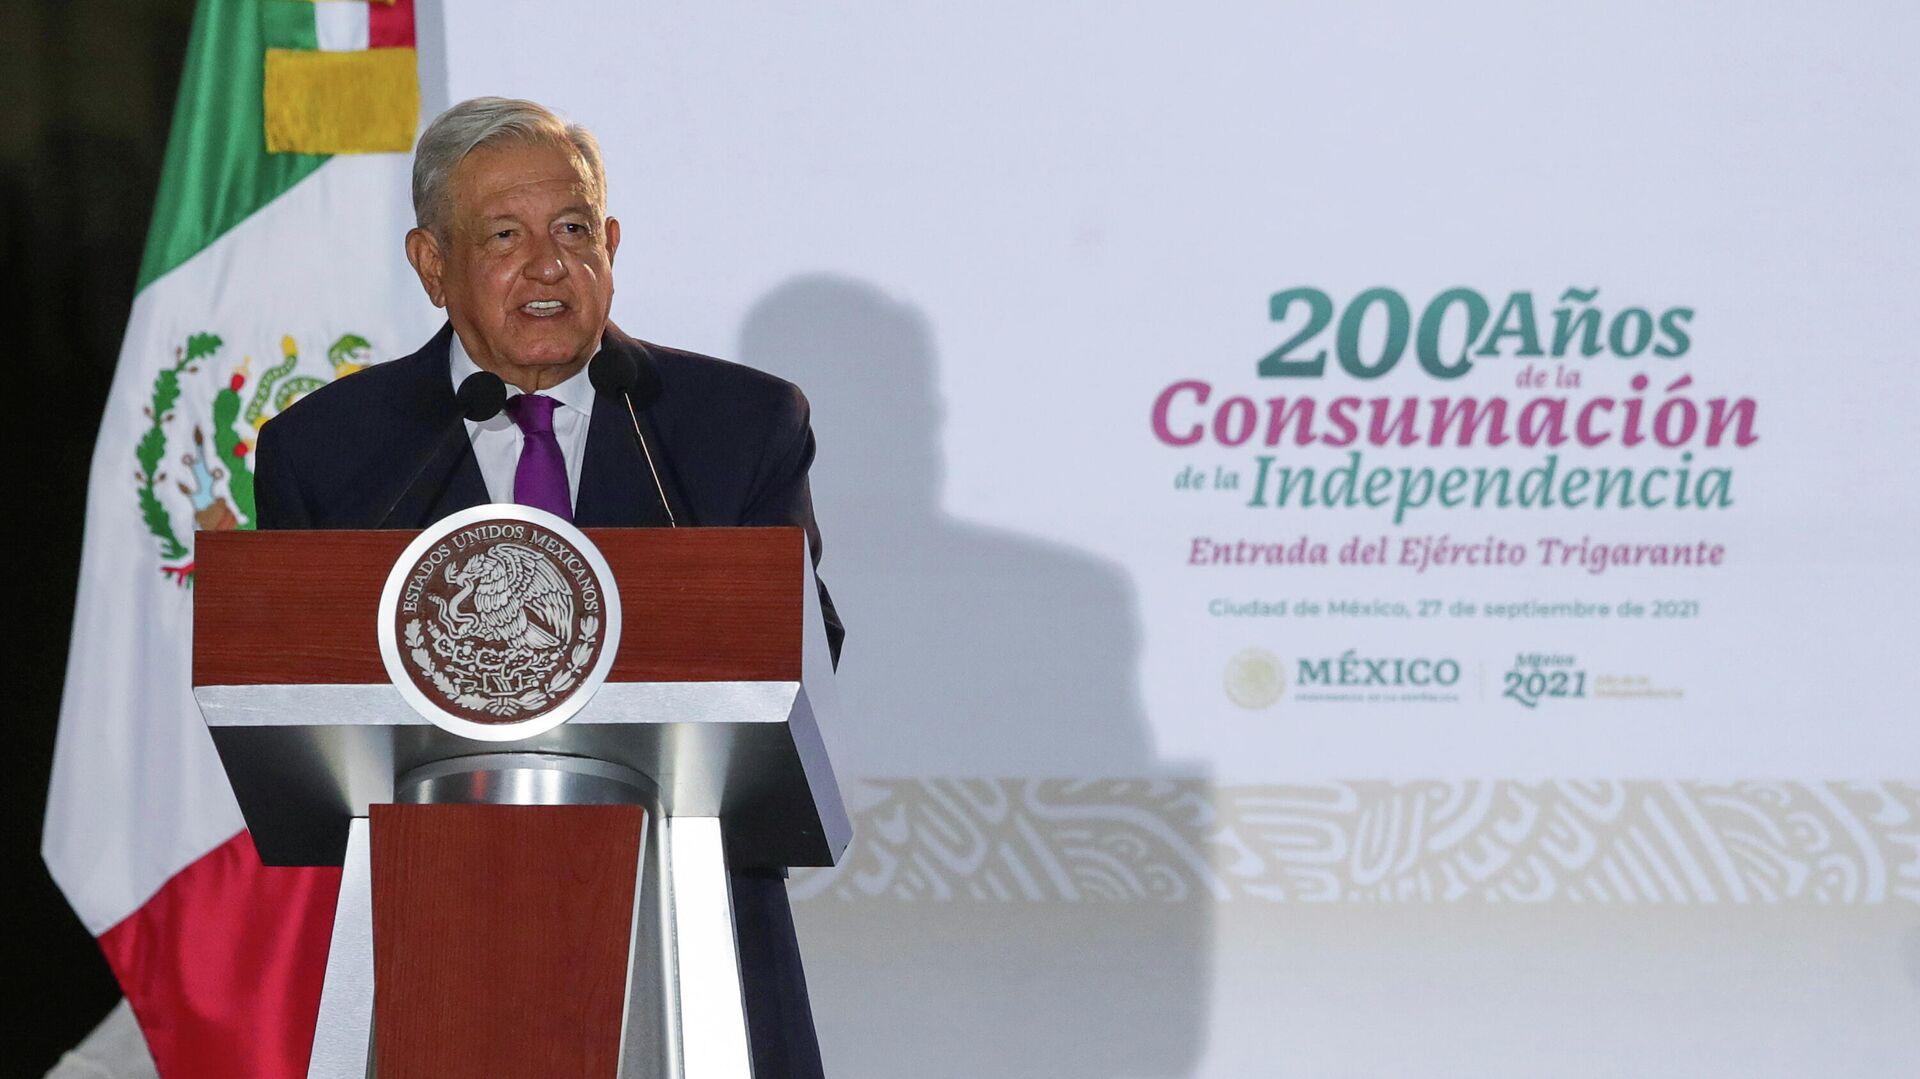 El presidente de México, Andrés Manuel López Obrador - Sputnik Mundo, 1920, 28.09.2021